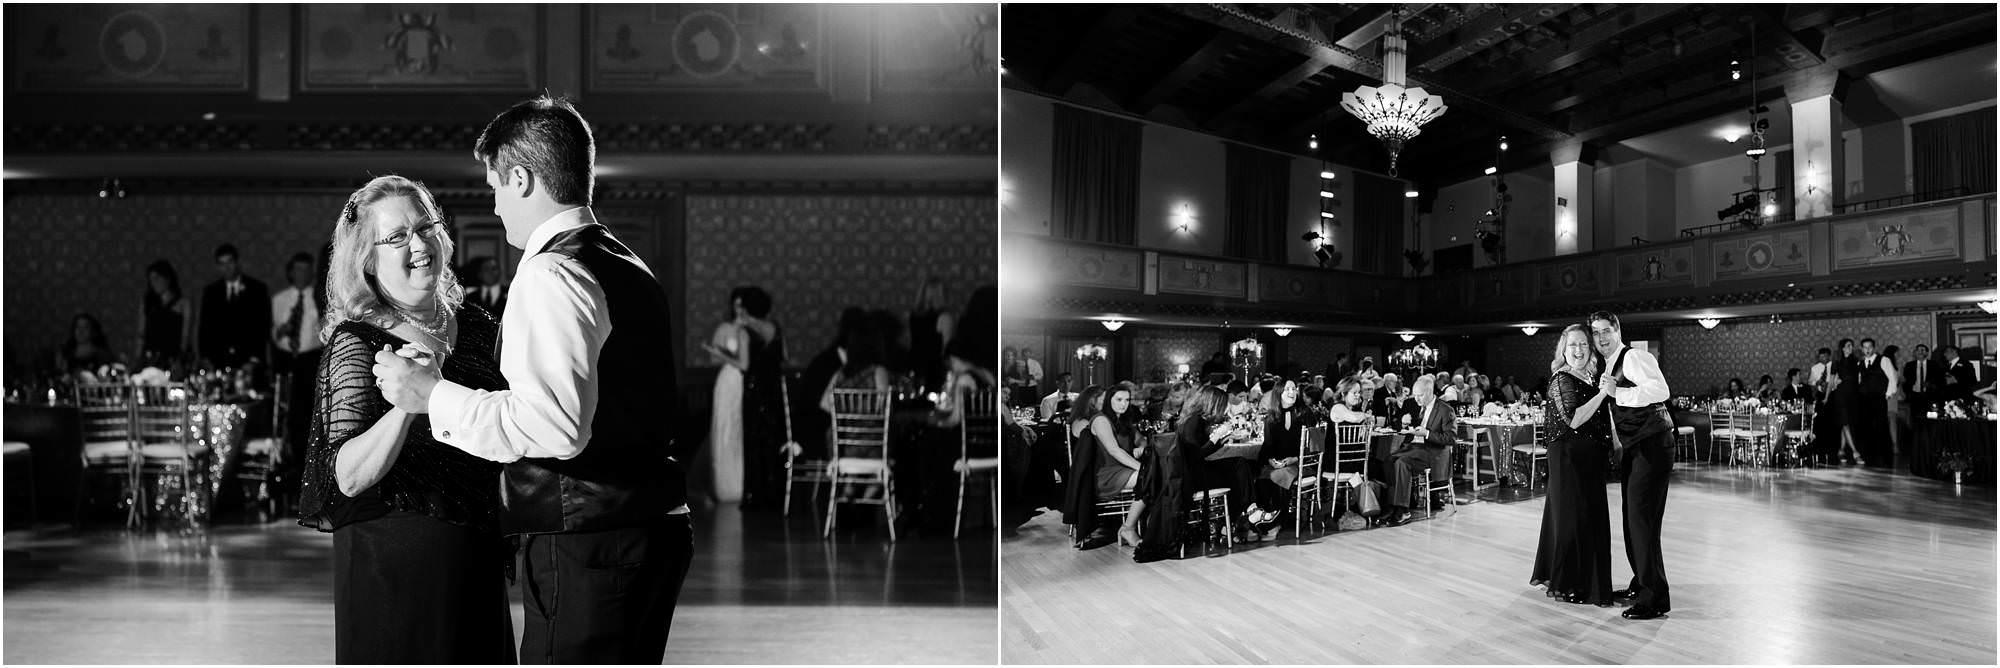 Scranton Cultural Center Wedding Reception Mother Son Slow Dance